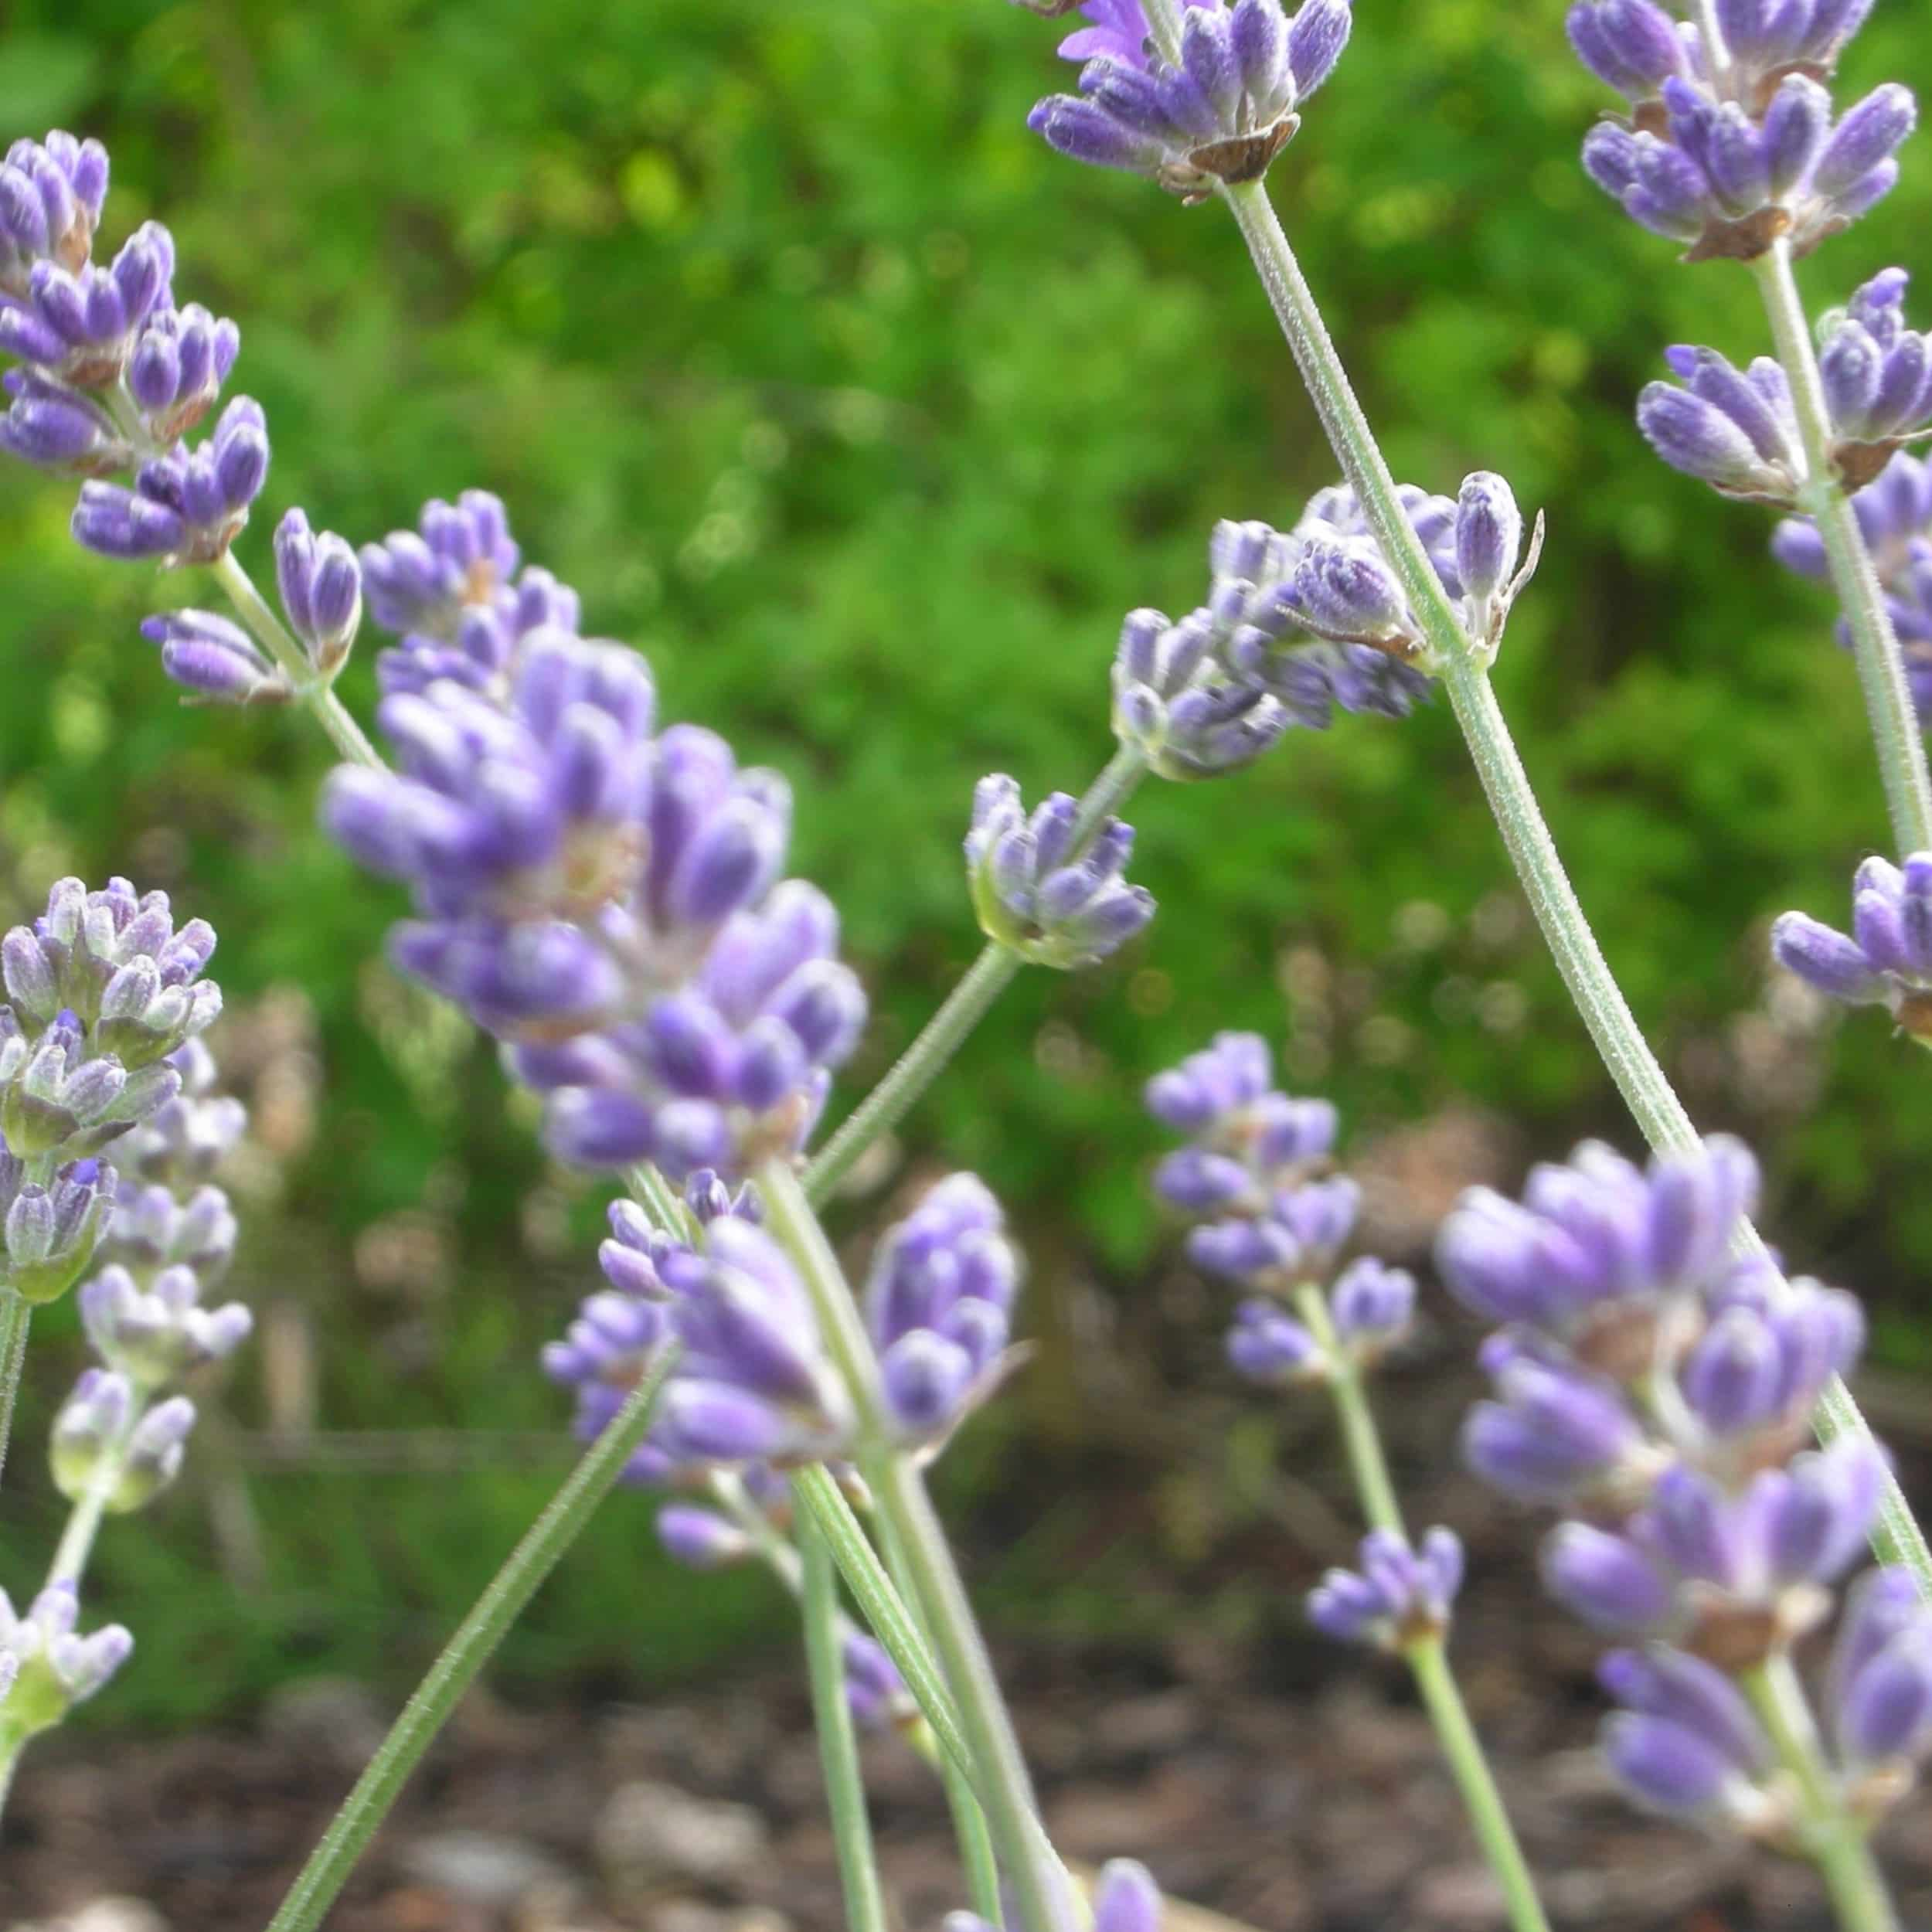 Lavandula angustifolia 'Munstead' - Garten-Lavendel